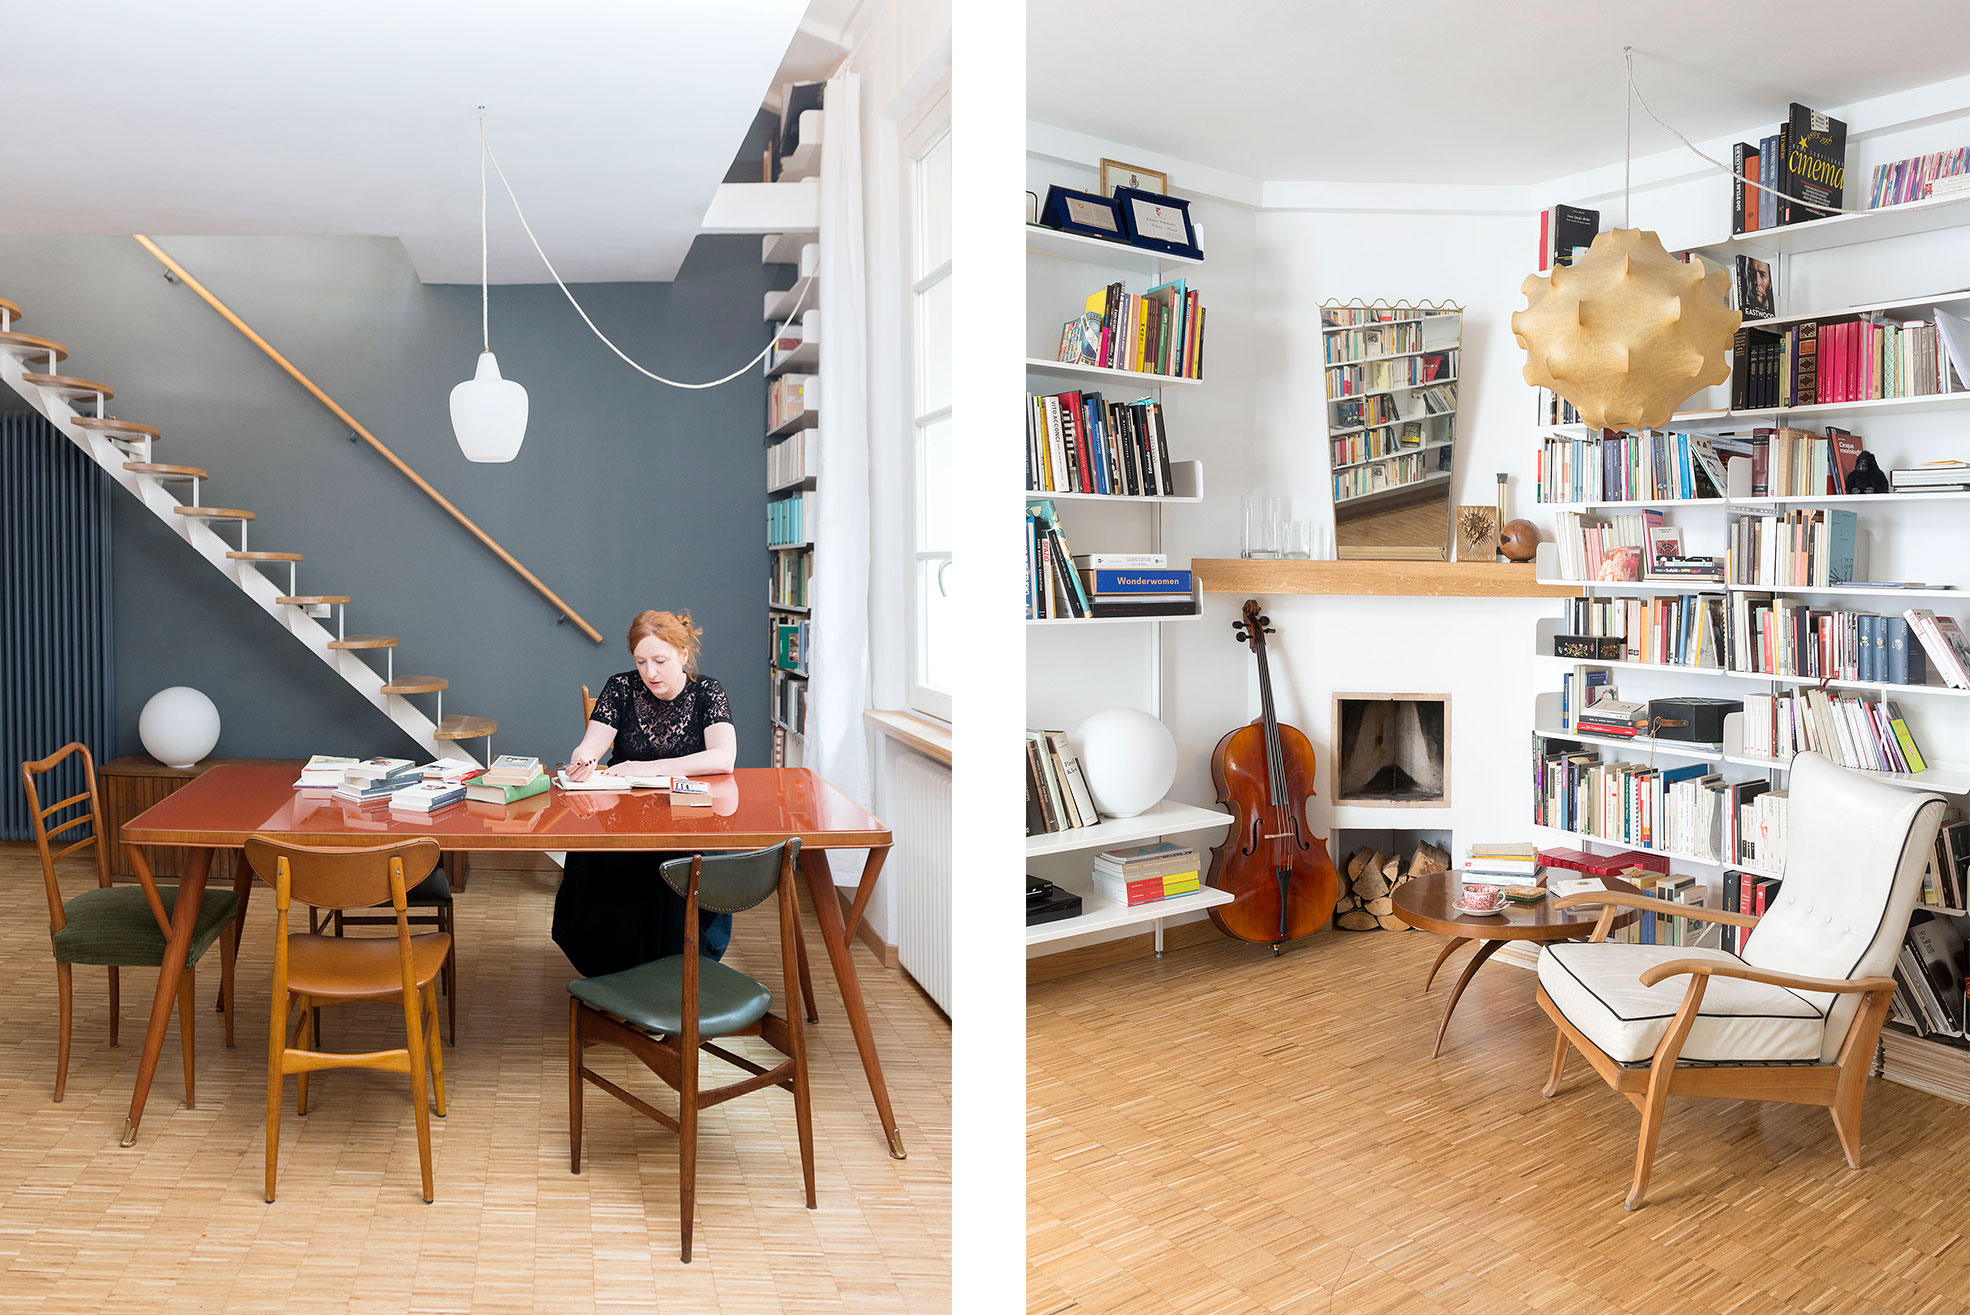 Details of the livingroom of Federica Fracassi's Home Photographer Maria Teresa Furnari